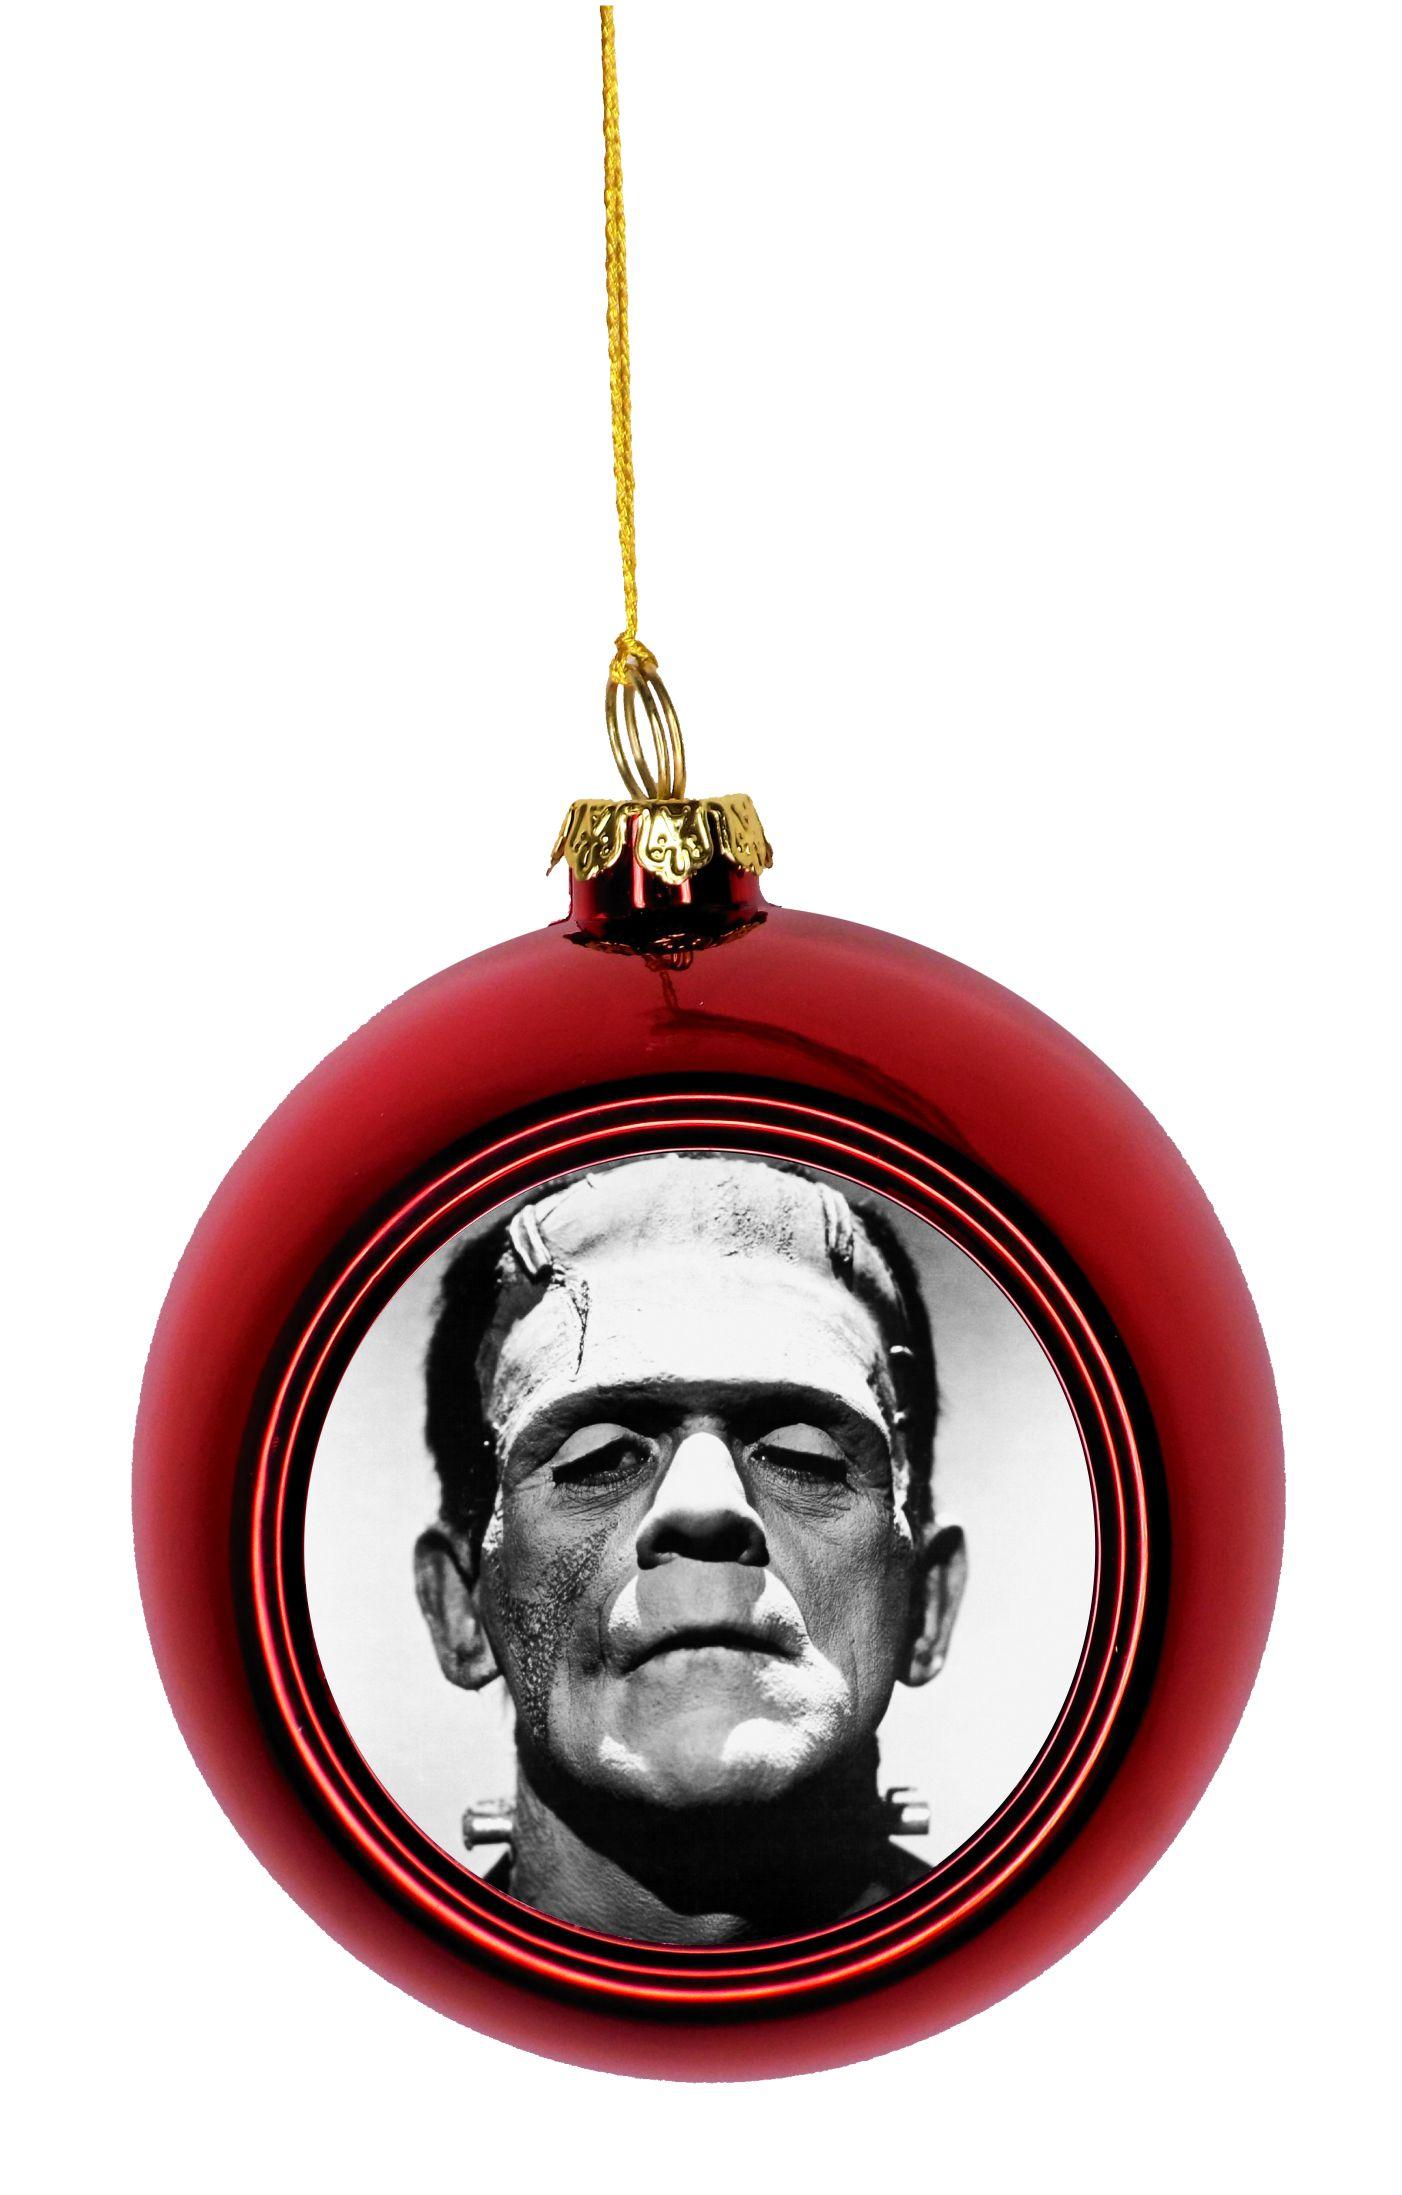 Frankenstein's Monster Bauble Christmas Ornaments Red ...